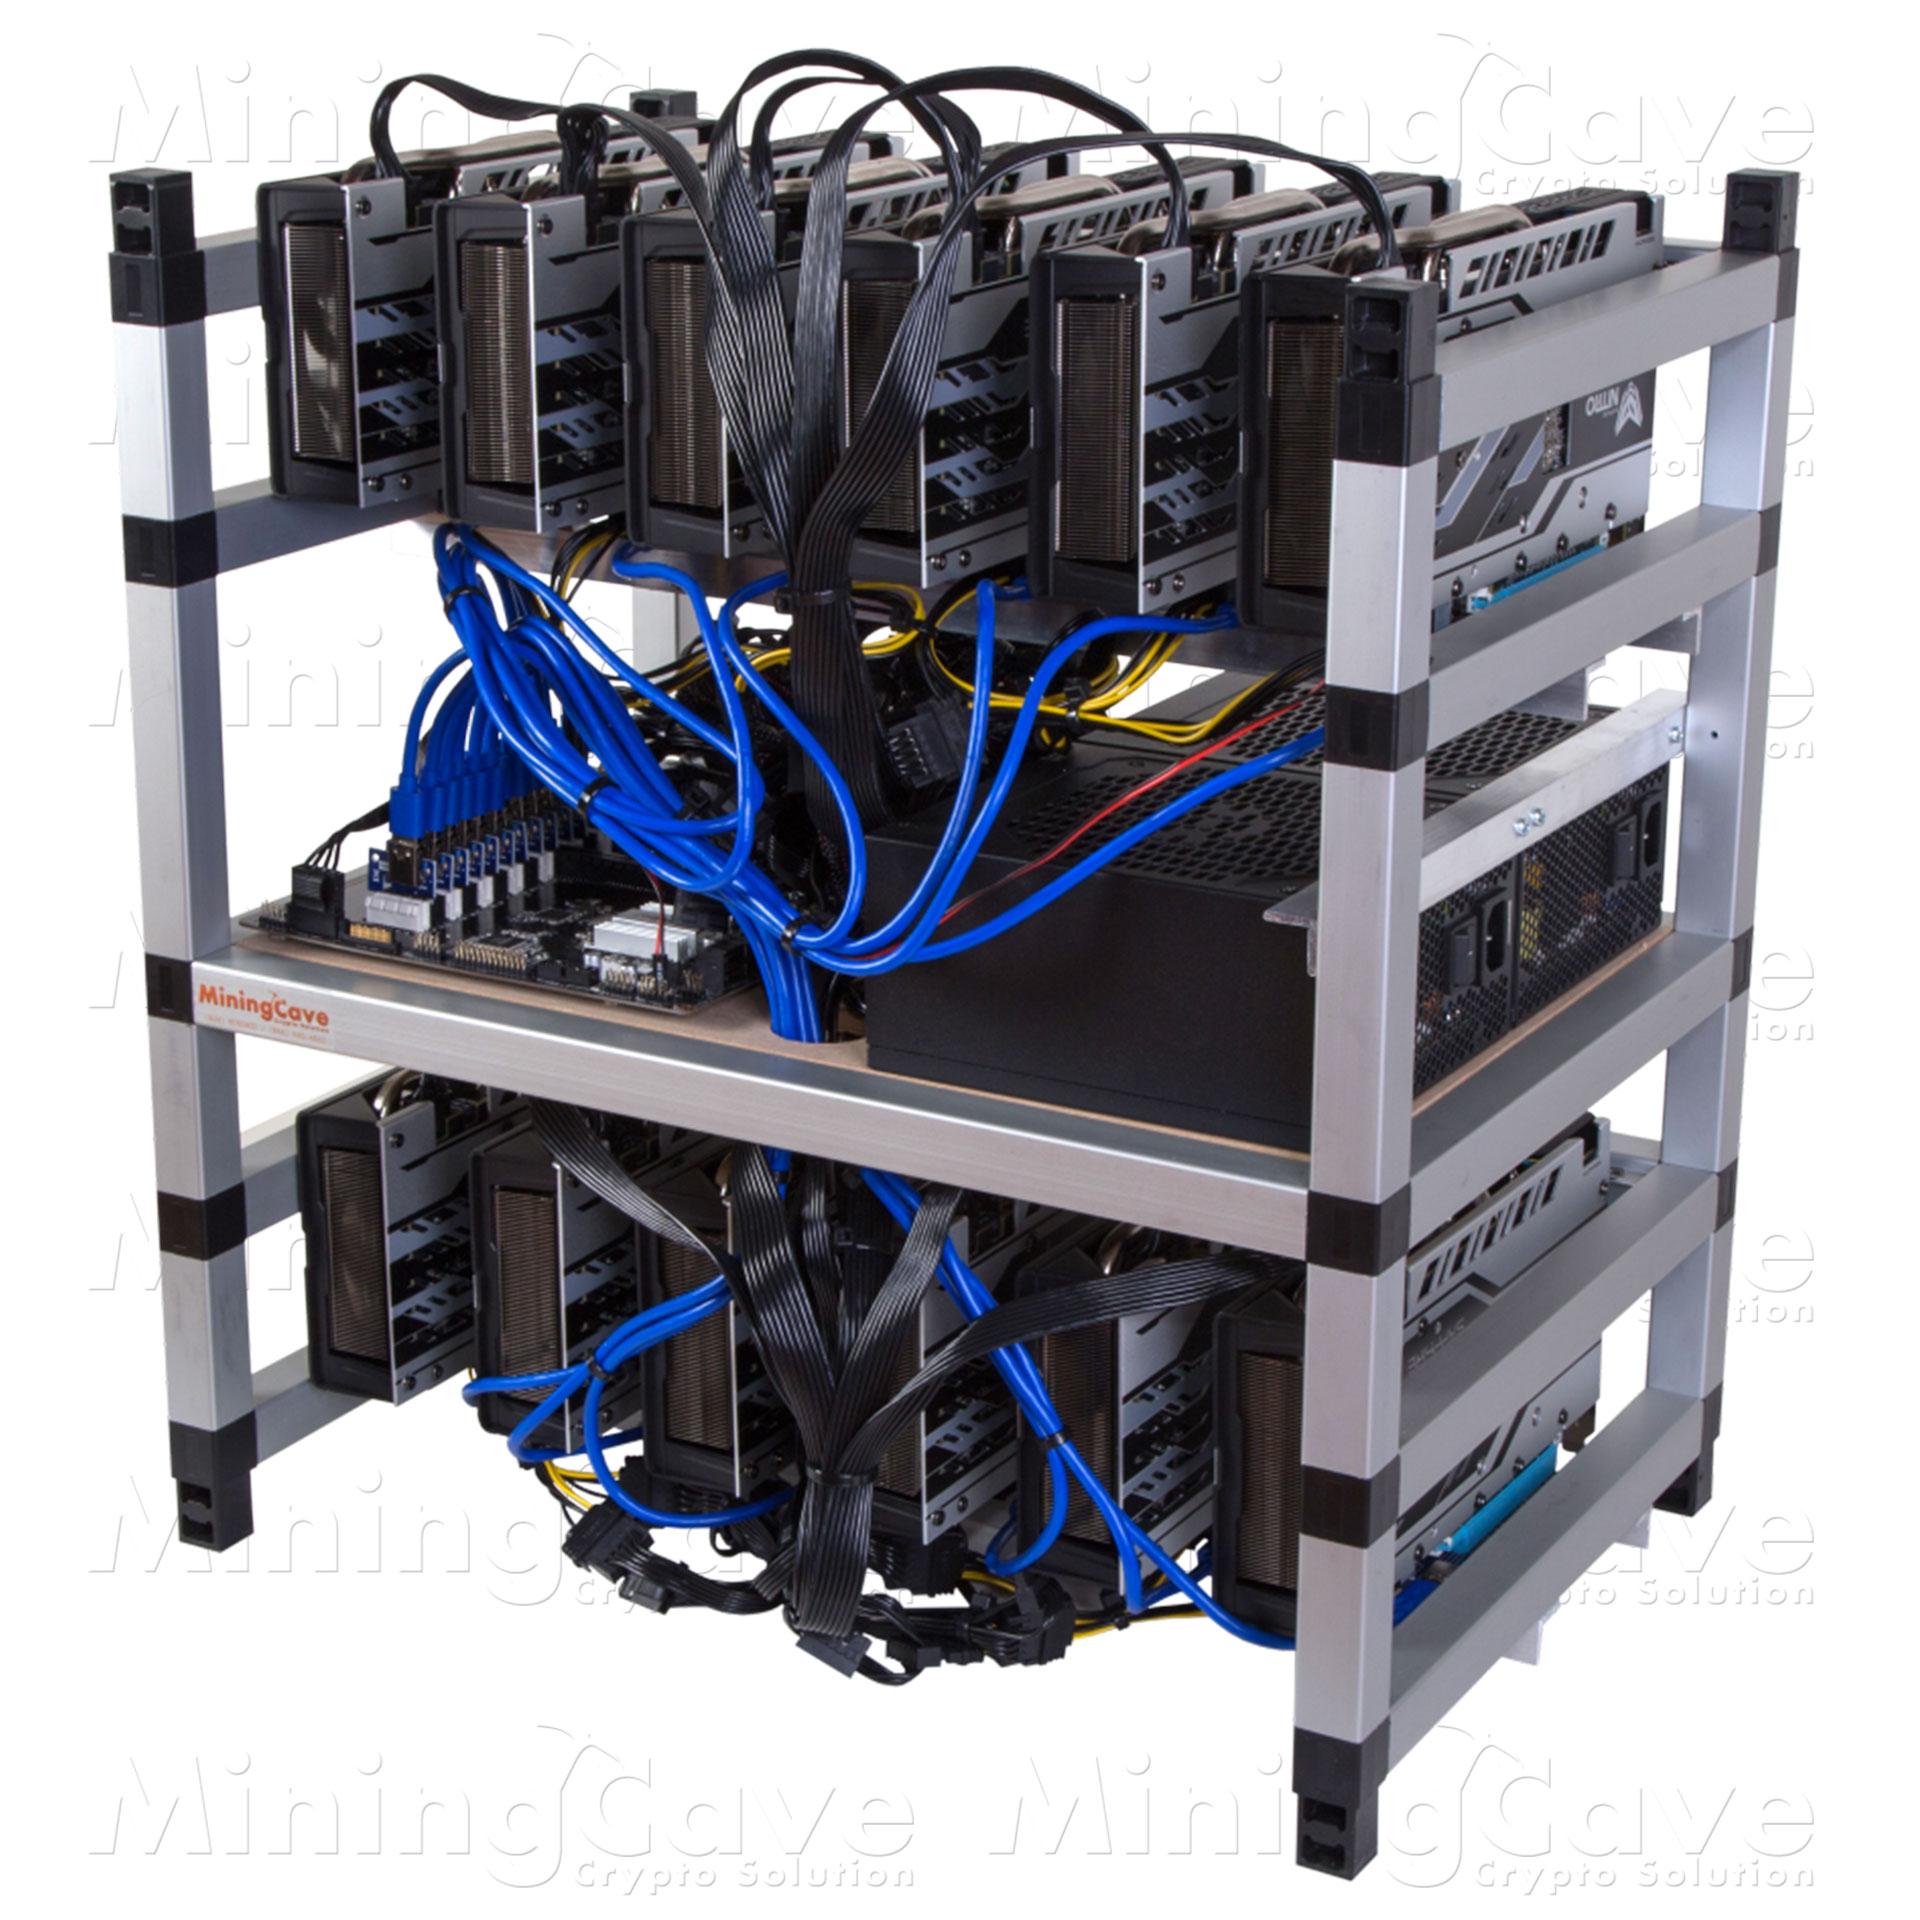 10 gpu mining rig